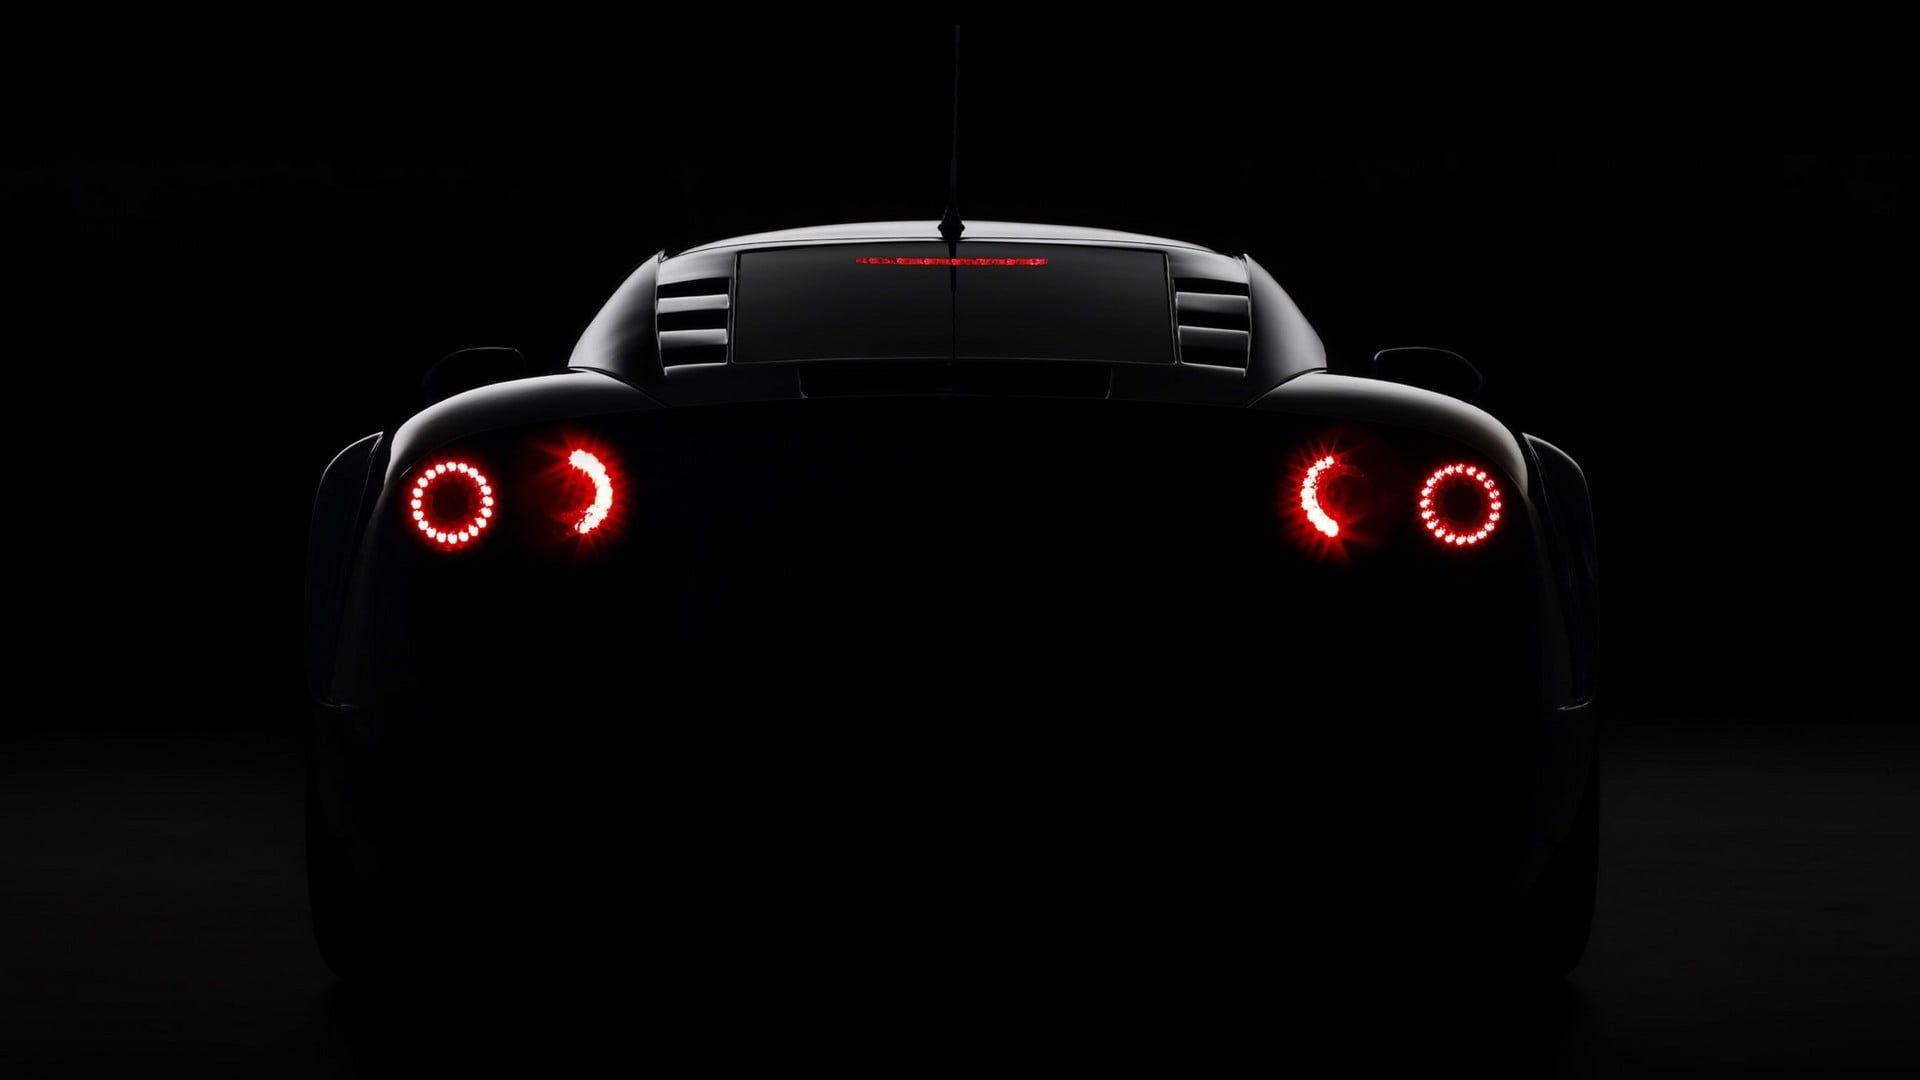 Black Sports Car Noble M600 Car Bugatti Veyron Lights Super Car Black Dark Vehicle Bugatti 1080p Wallpap In 2021 Sports Car Wallpaper Super Cars Red Sports Car